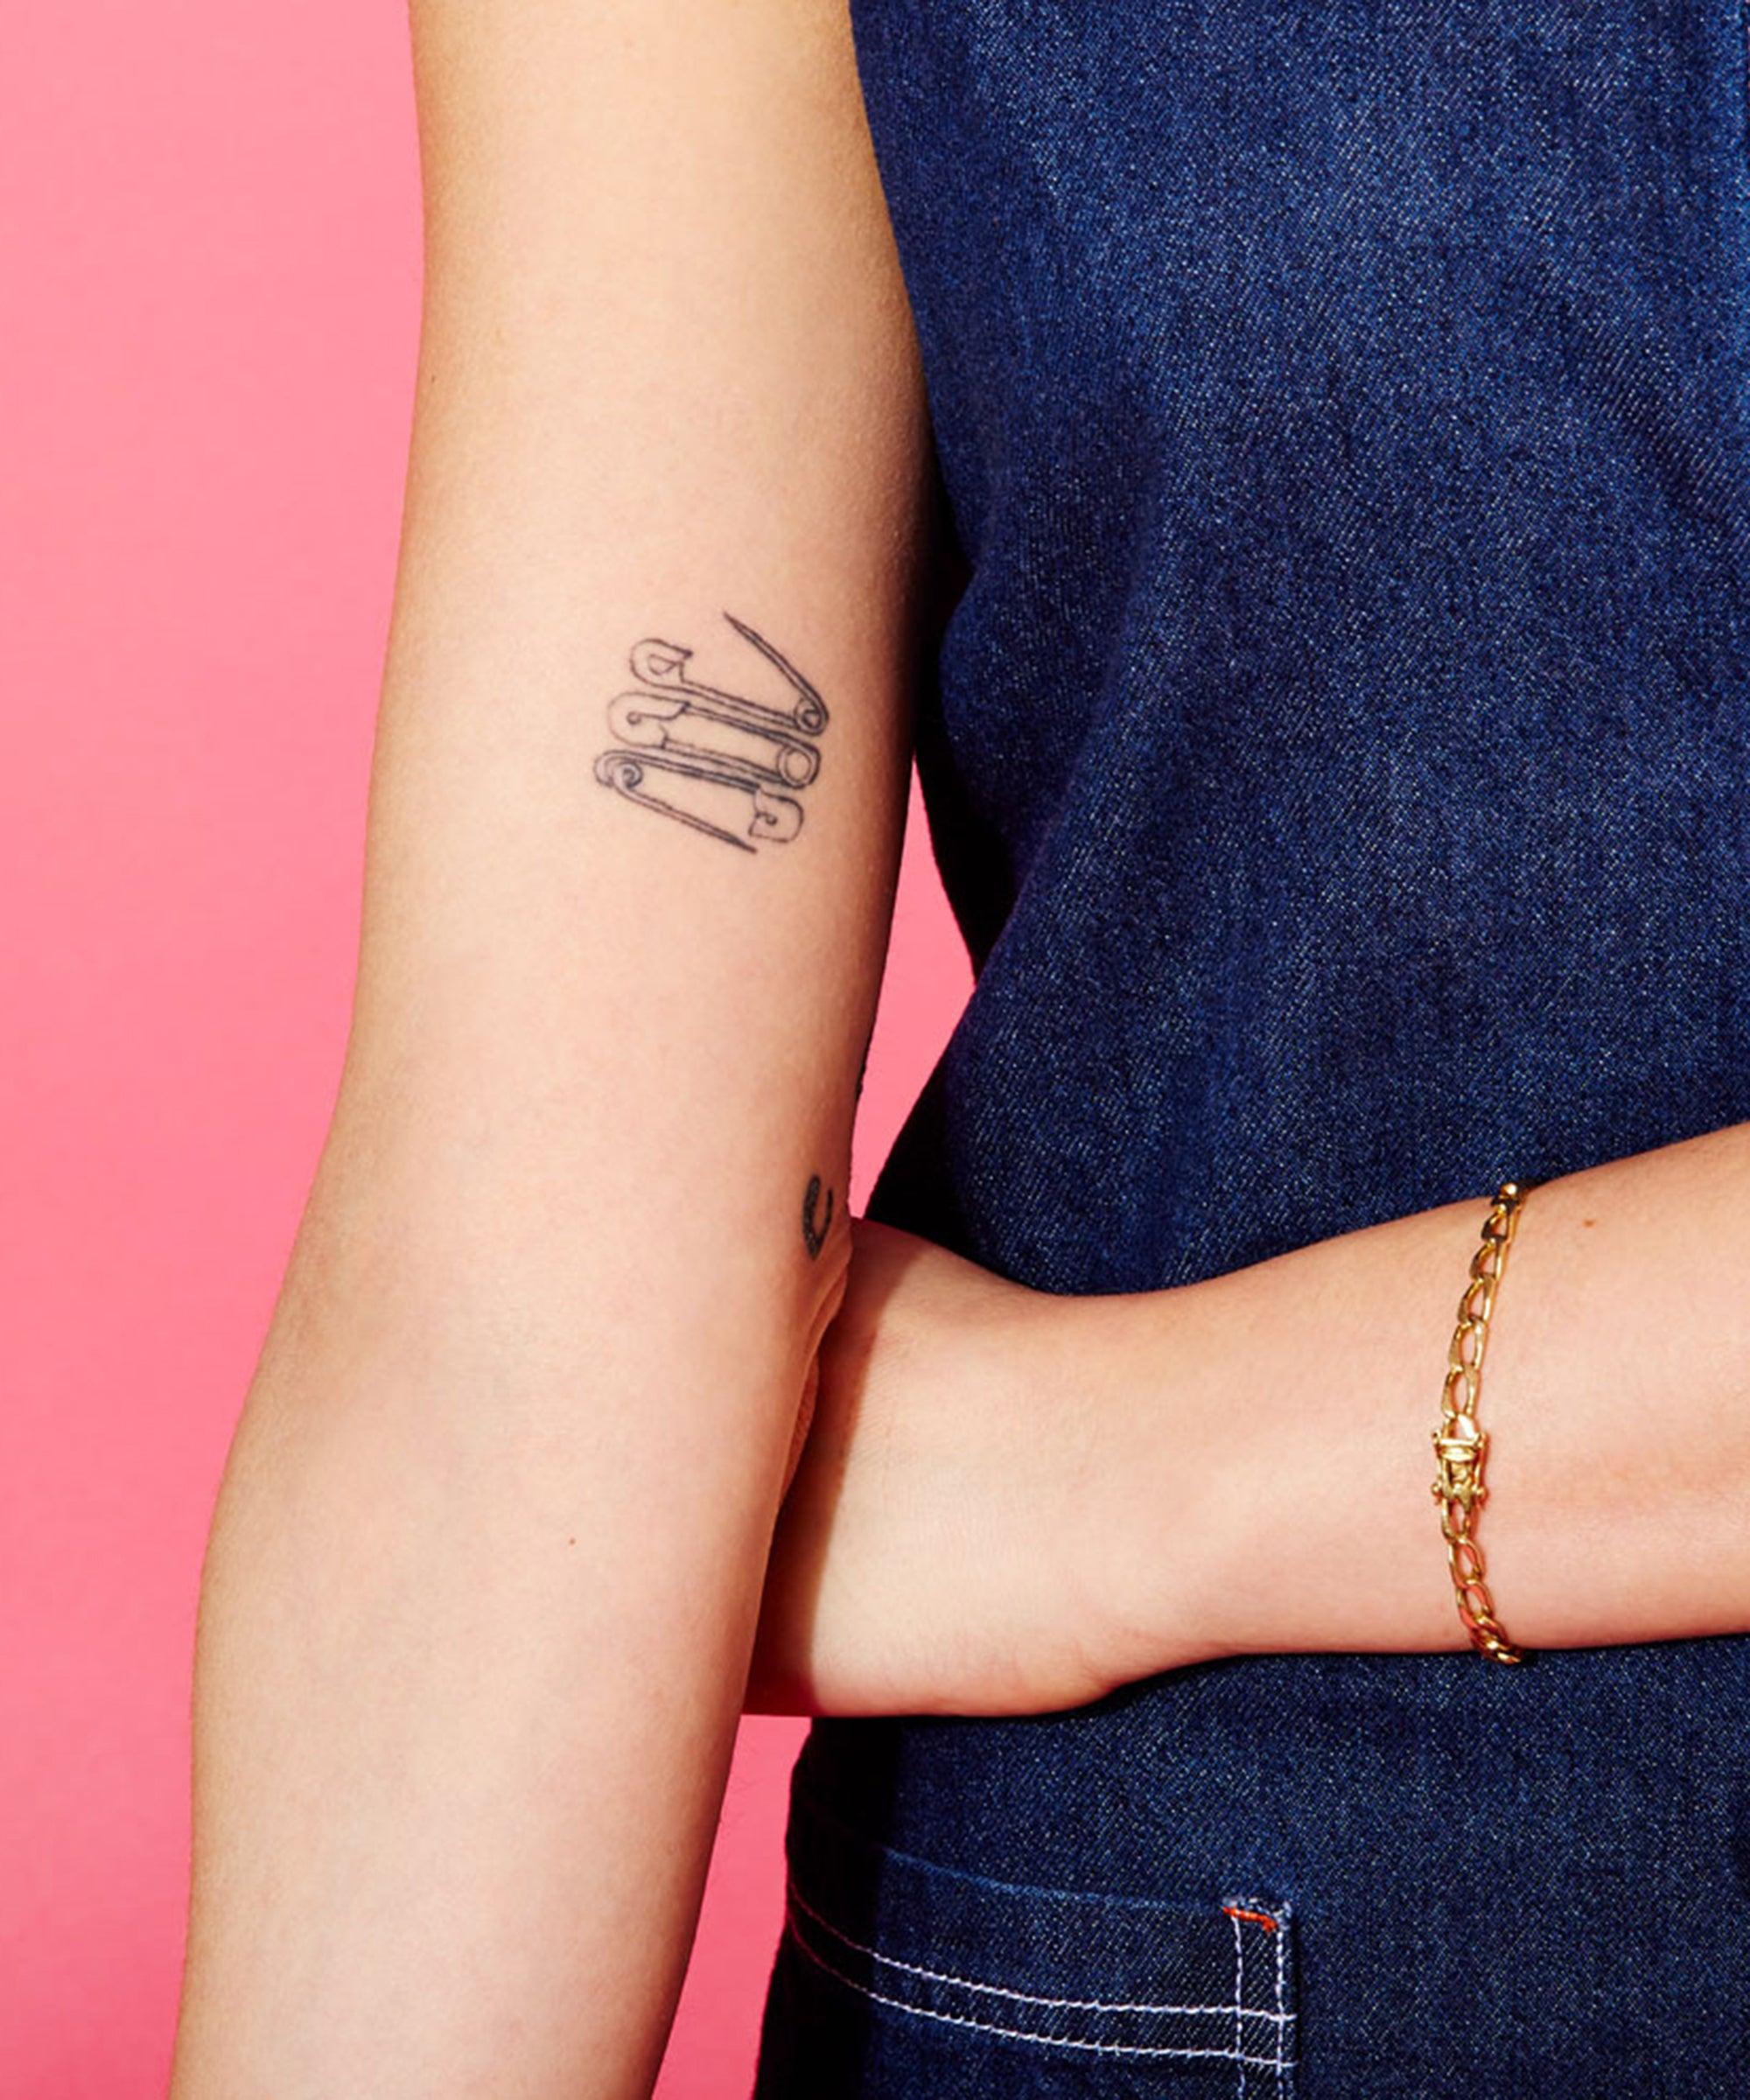 Tattoos Increase Self Esteem Depression Suicide Study